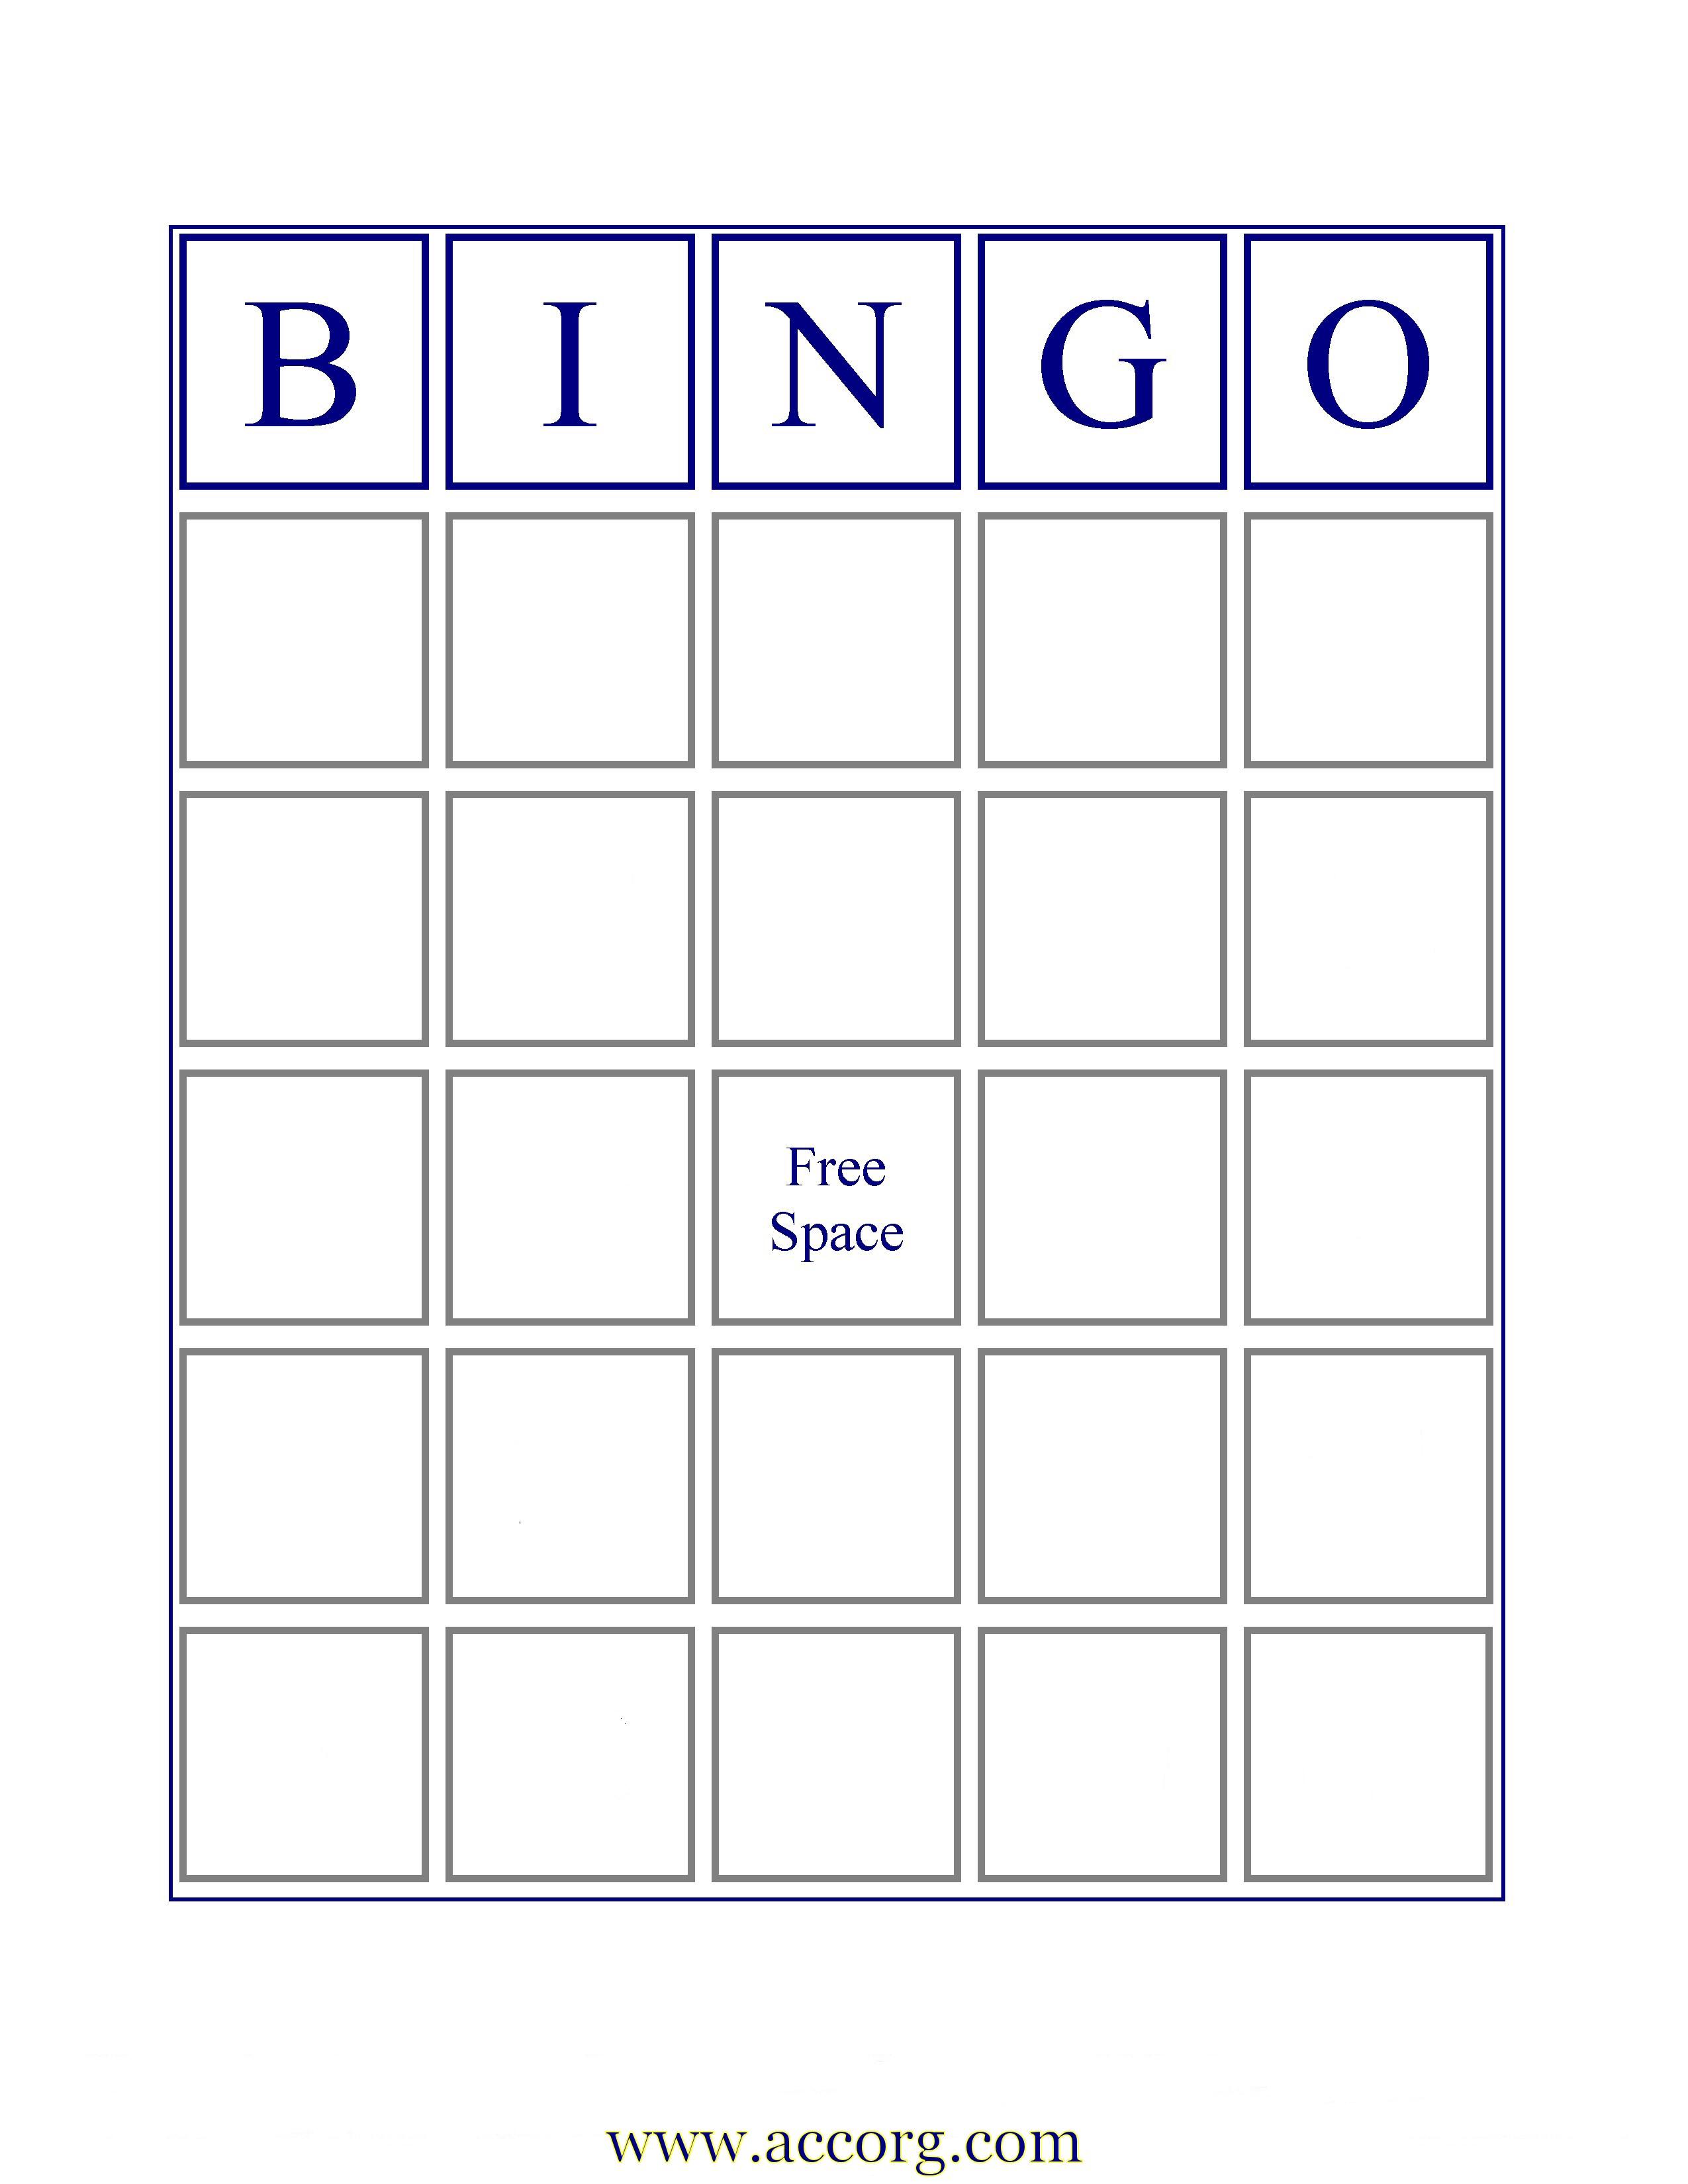 6 Images of Printable Bingo Sheets